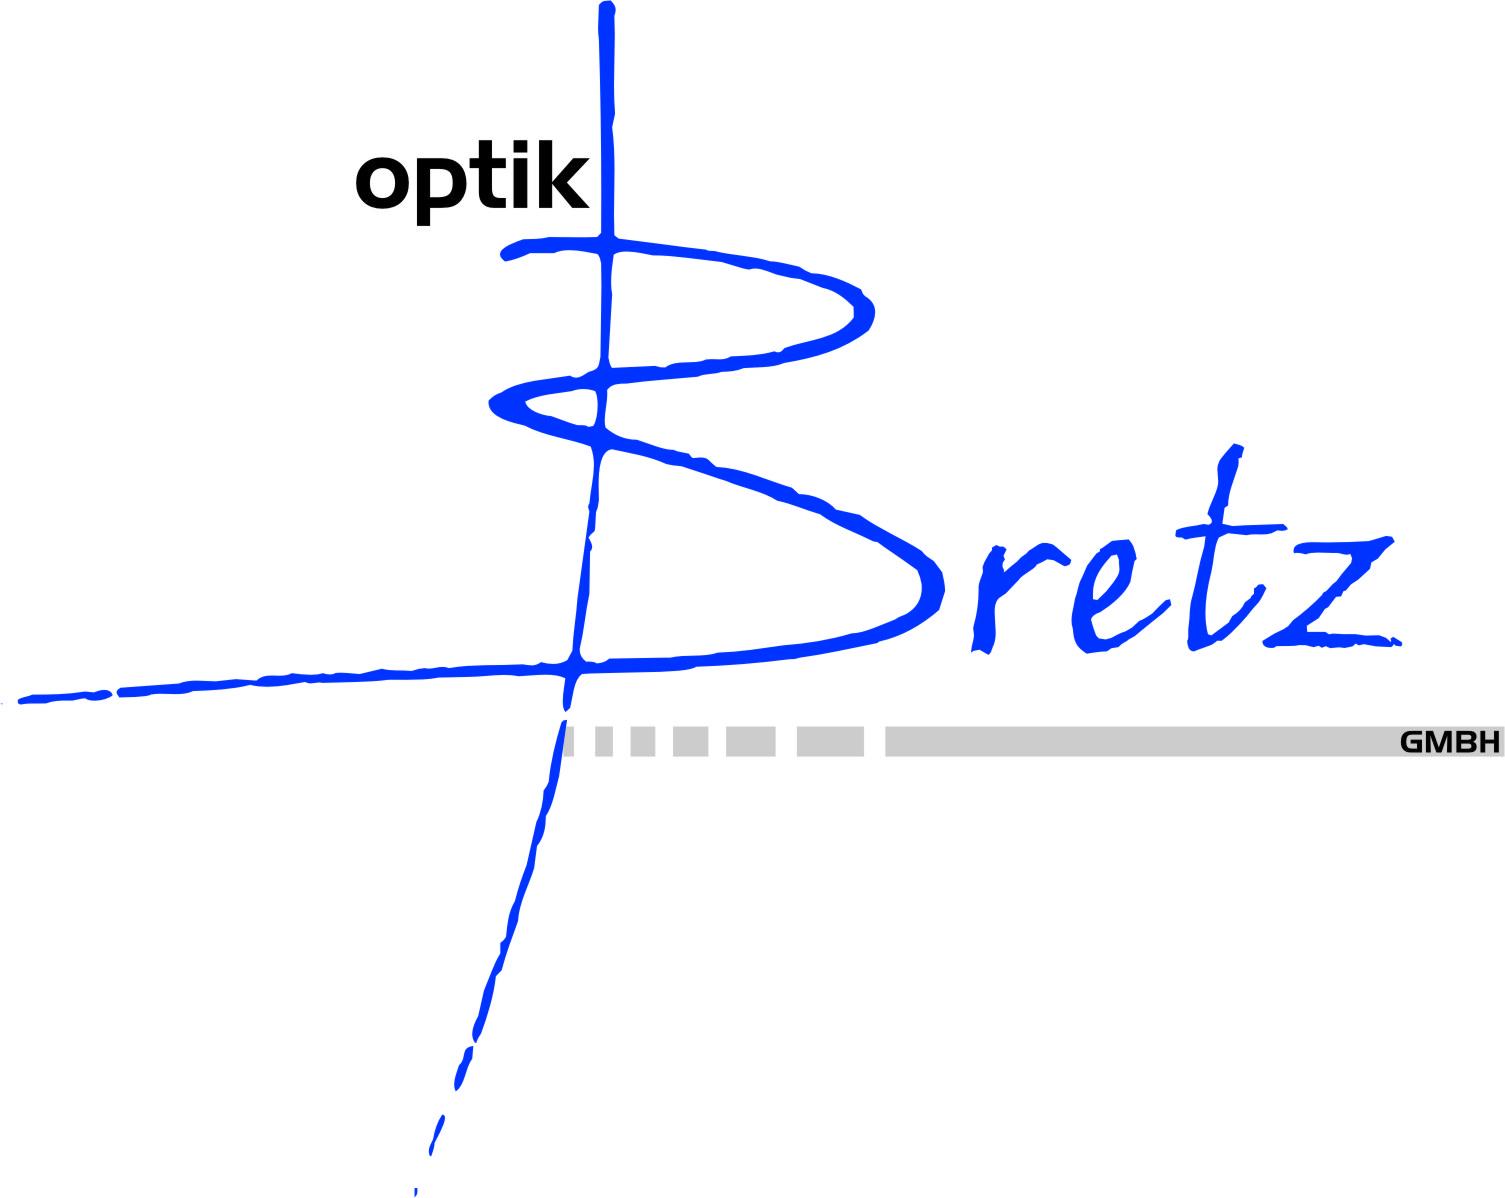 Optik Bretz